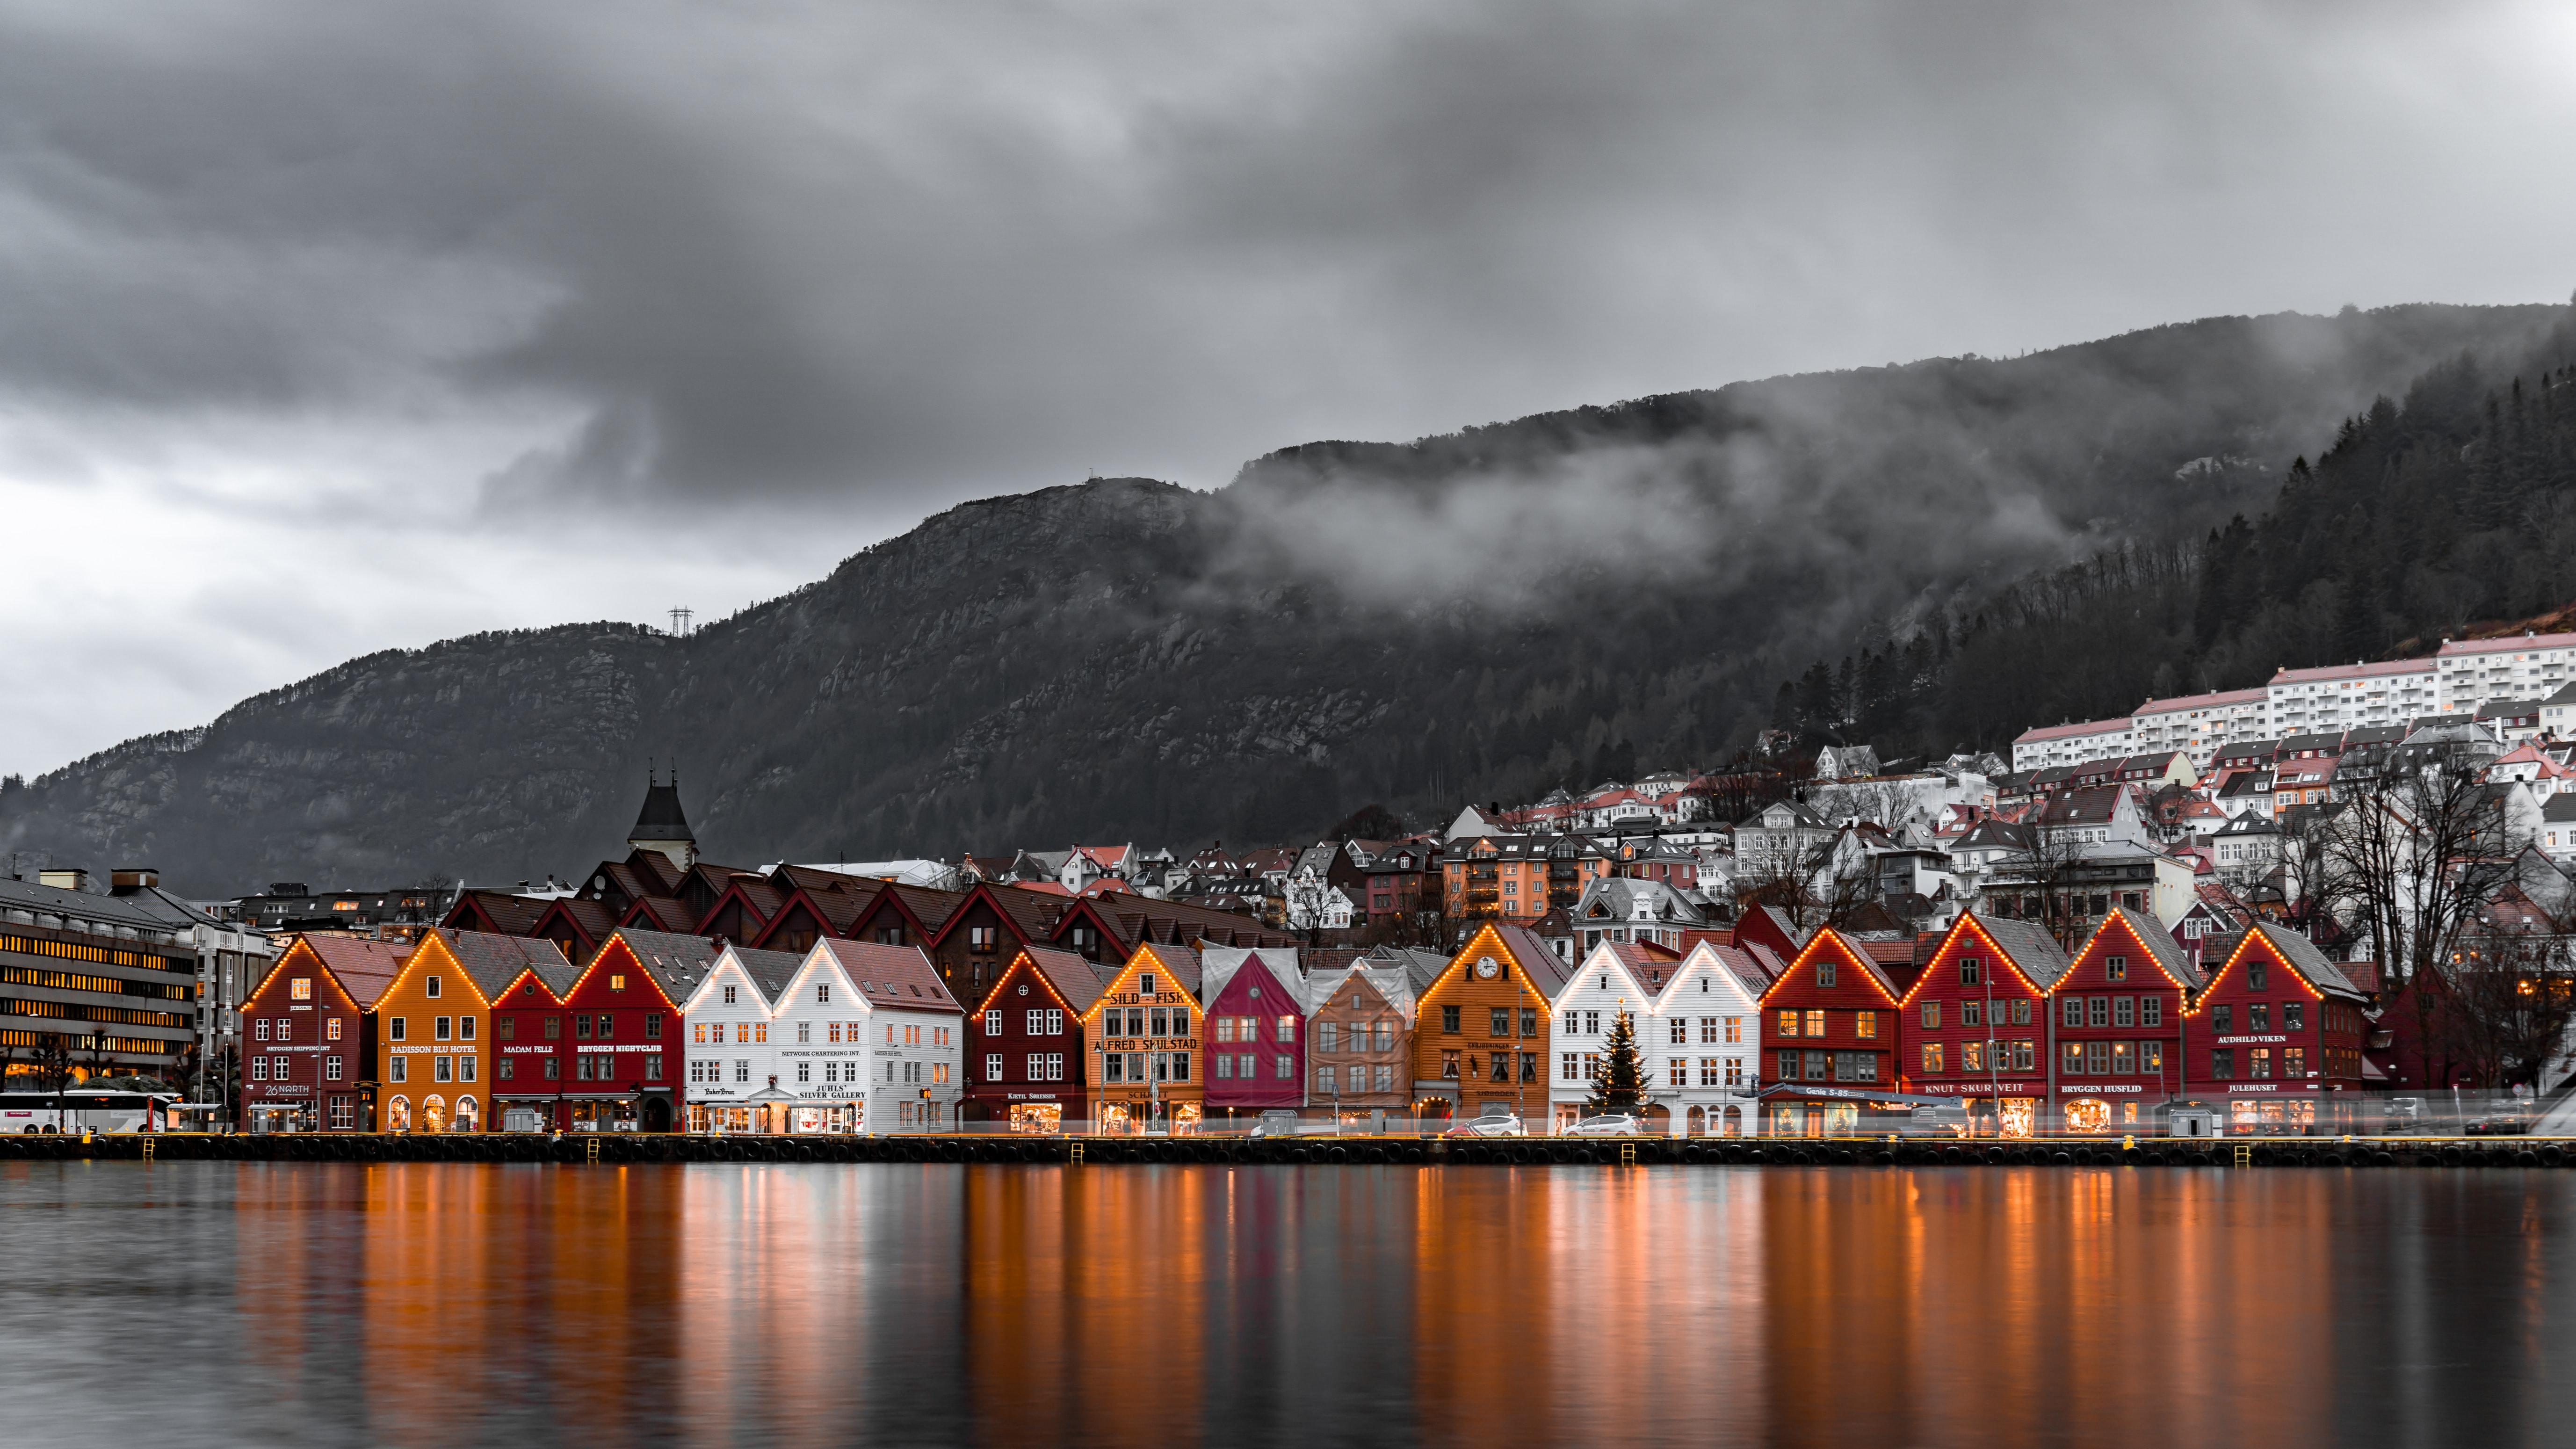 Bergen w Norwegii, fot.Michael Fousert/unsplash.com